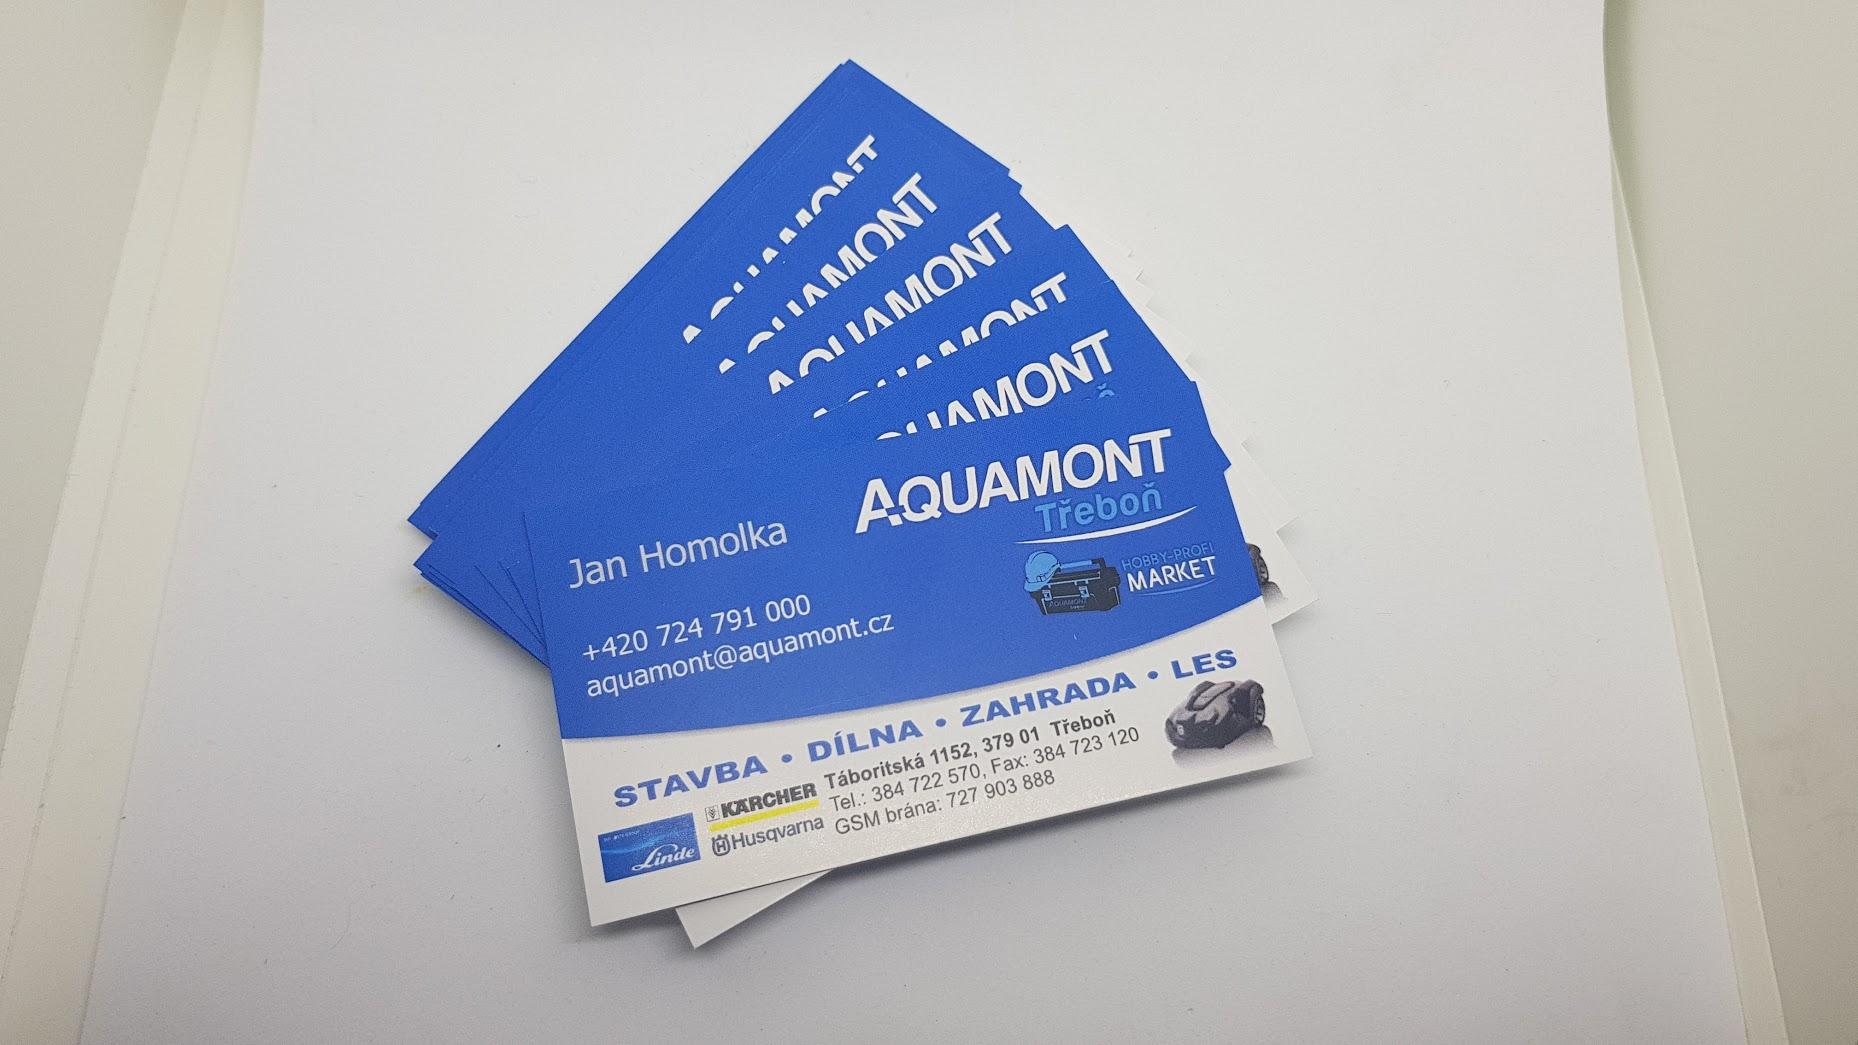 Vizitka Aquamont Třeboň